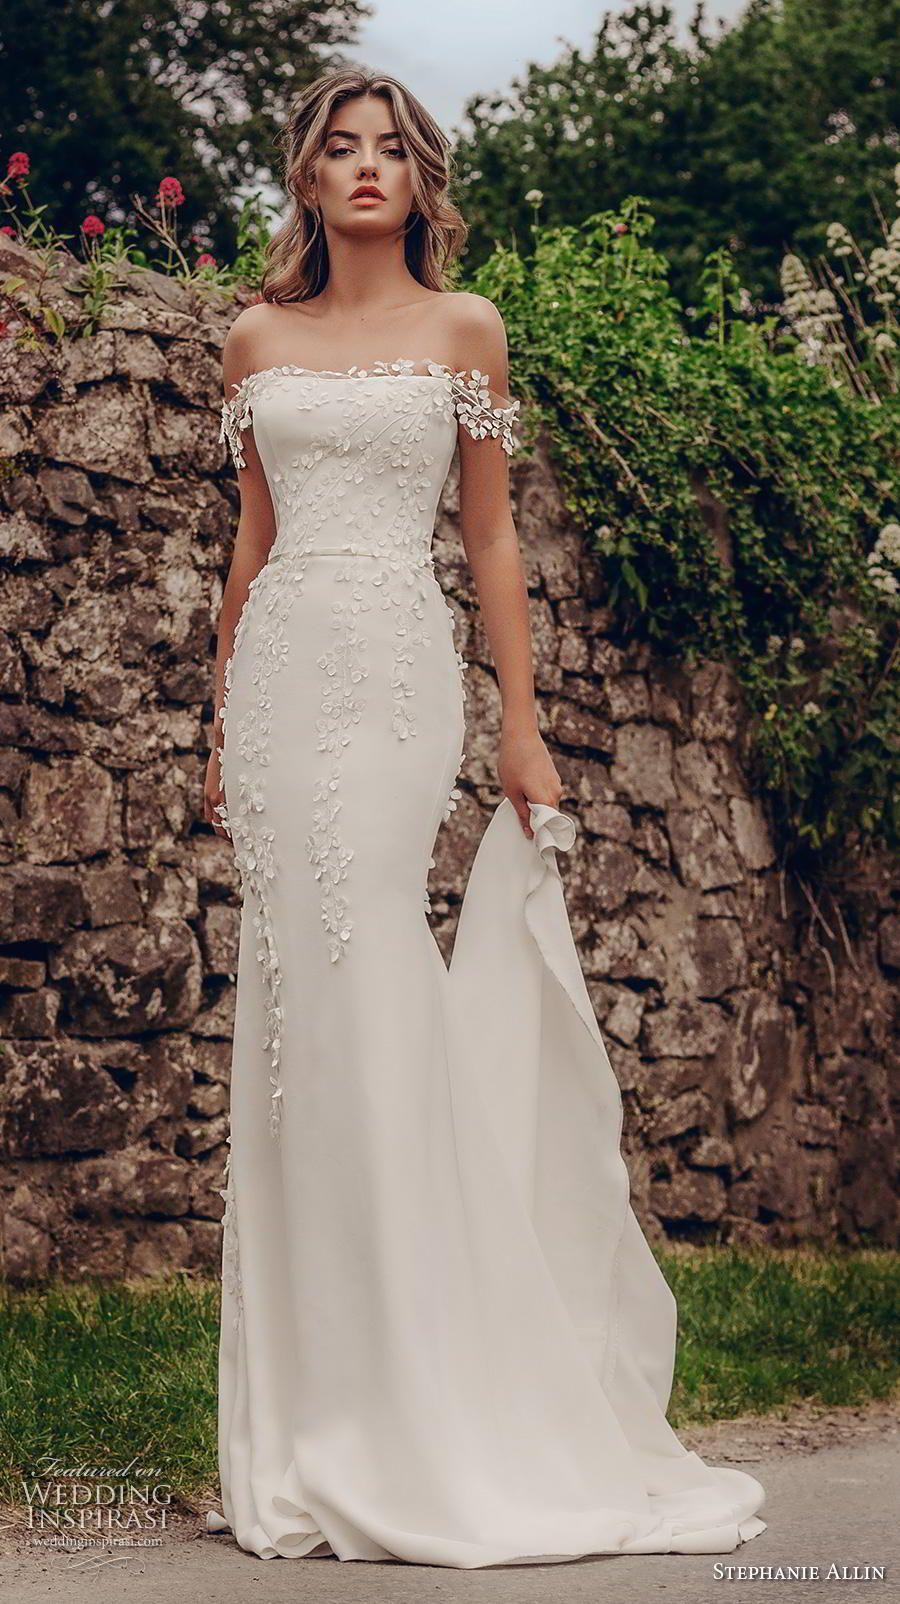 Pin By Carla Hopkins On Weddings Wedding Dresses Strapless